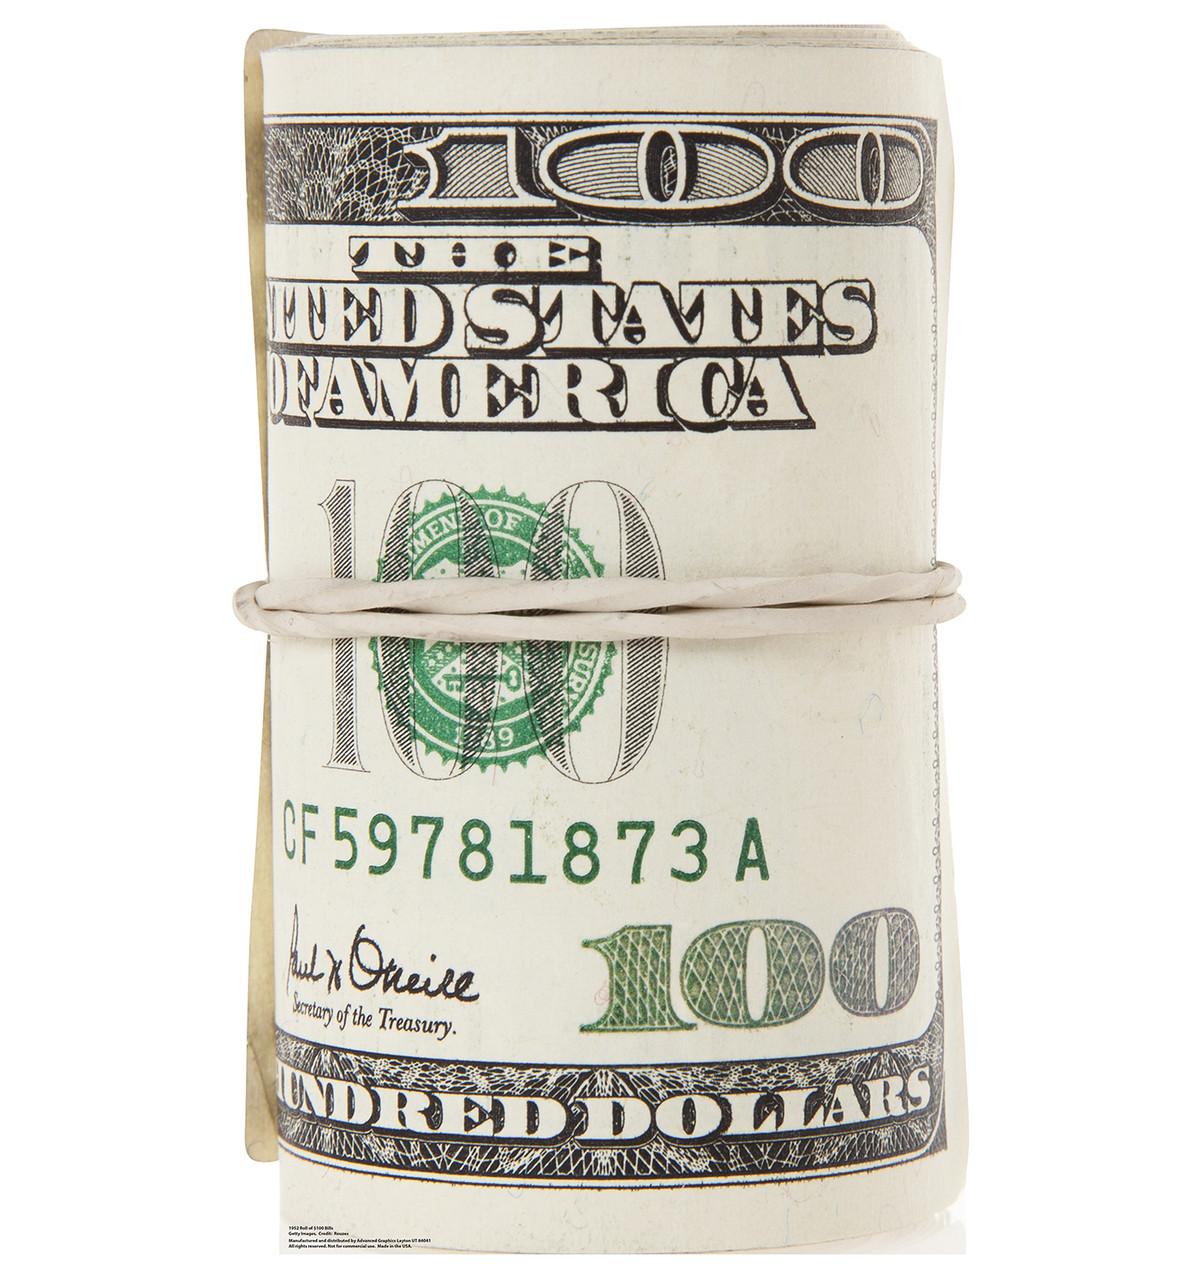 Life-size Roll of $100 Bills Cardboard Standup